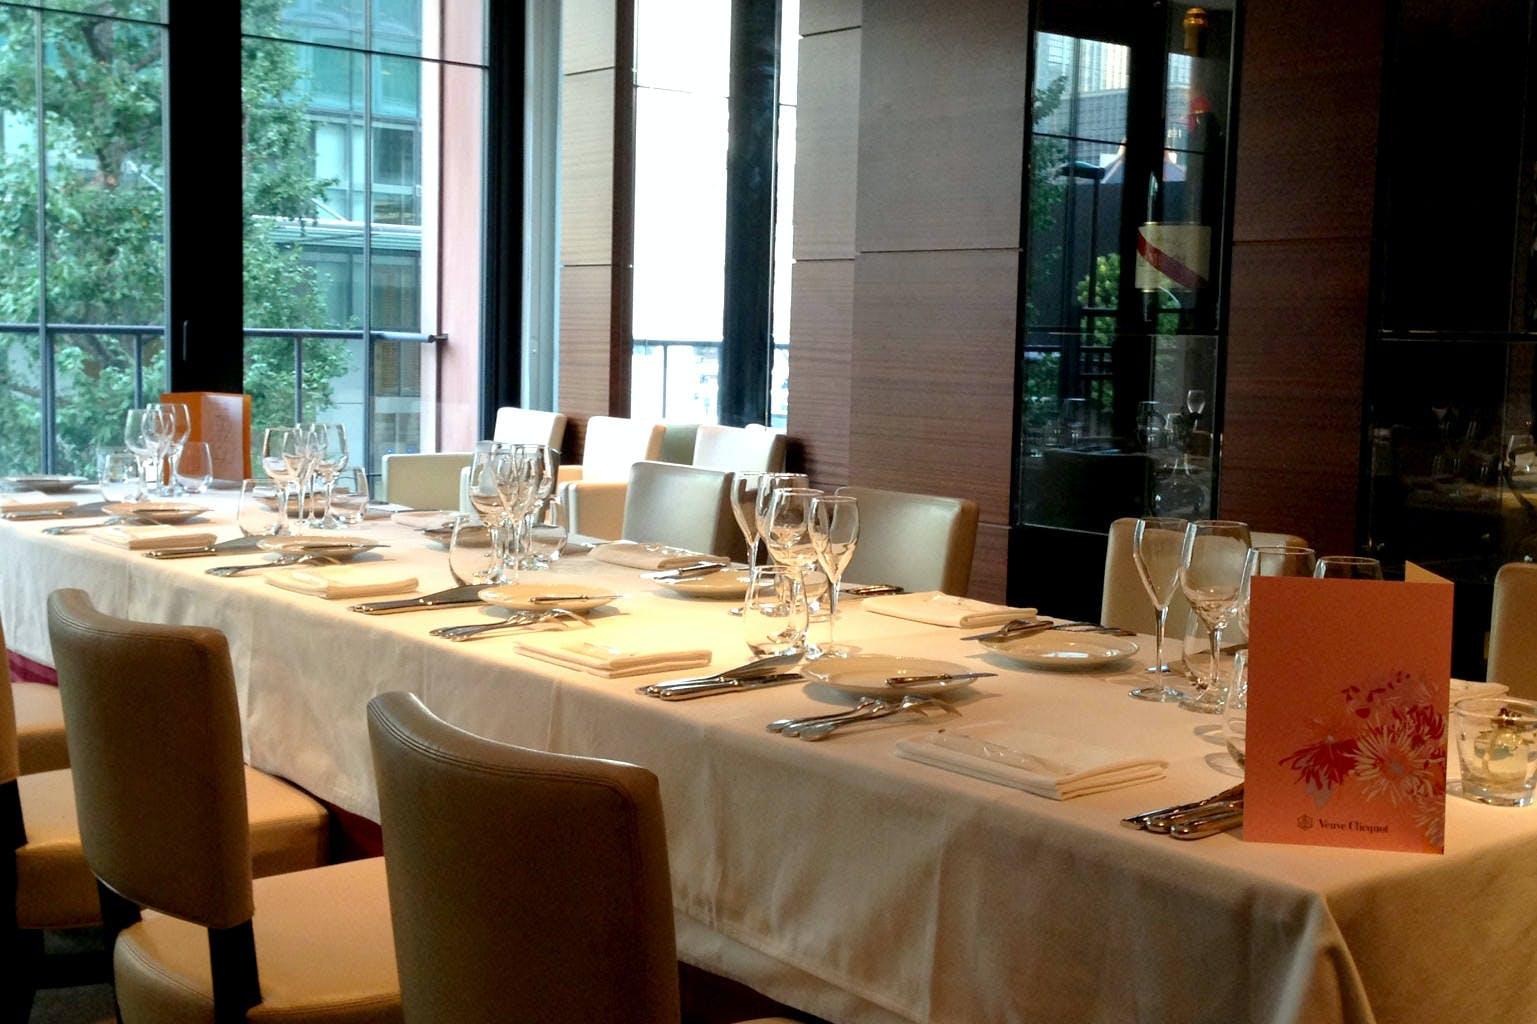 Restaurant Maison Barsac (メゾン バルサック)【2F】